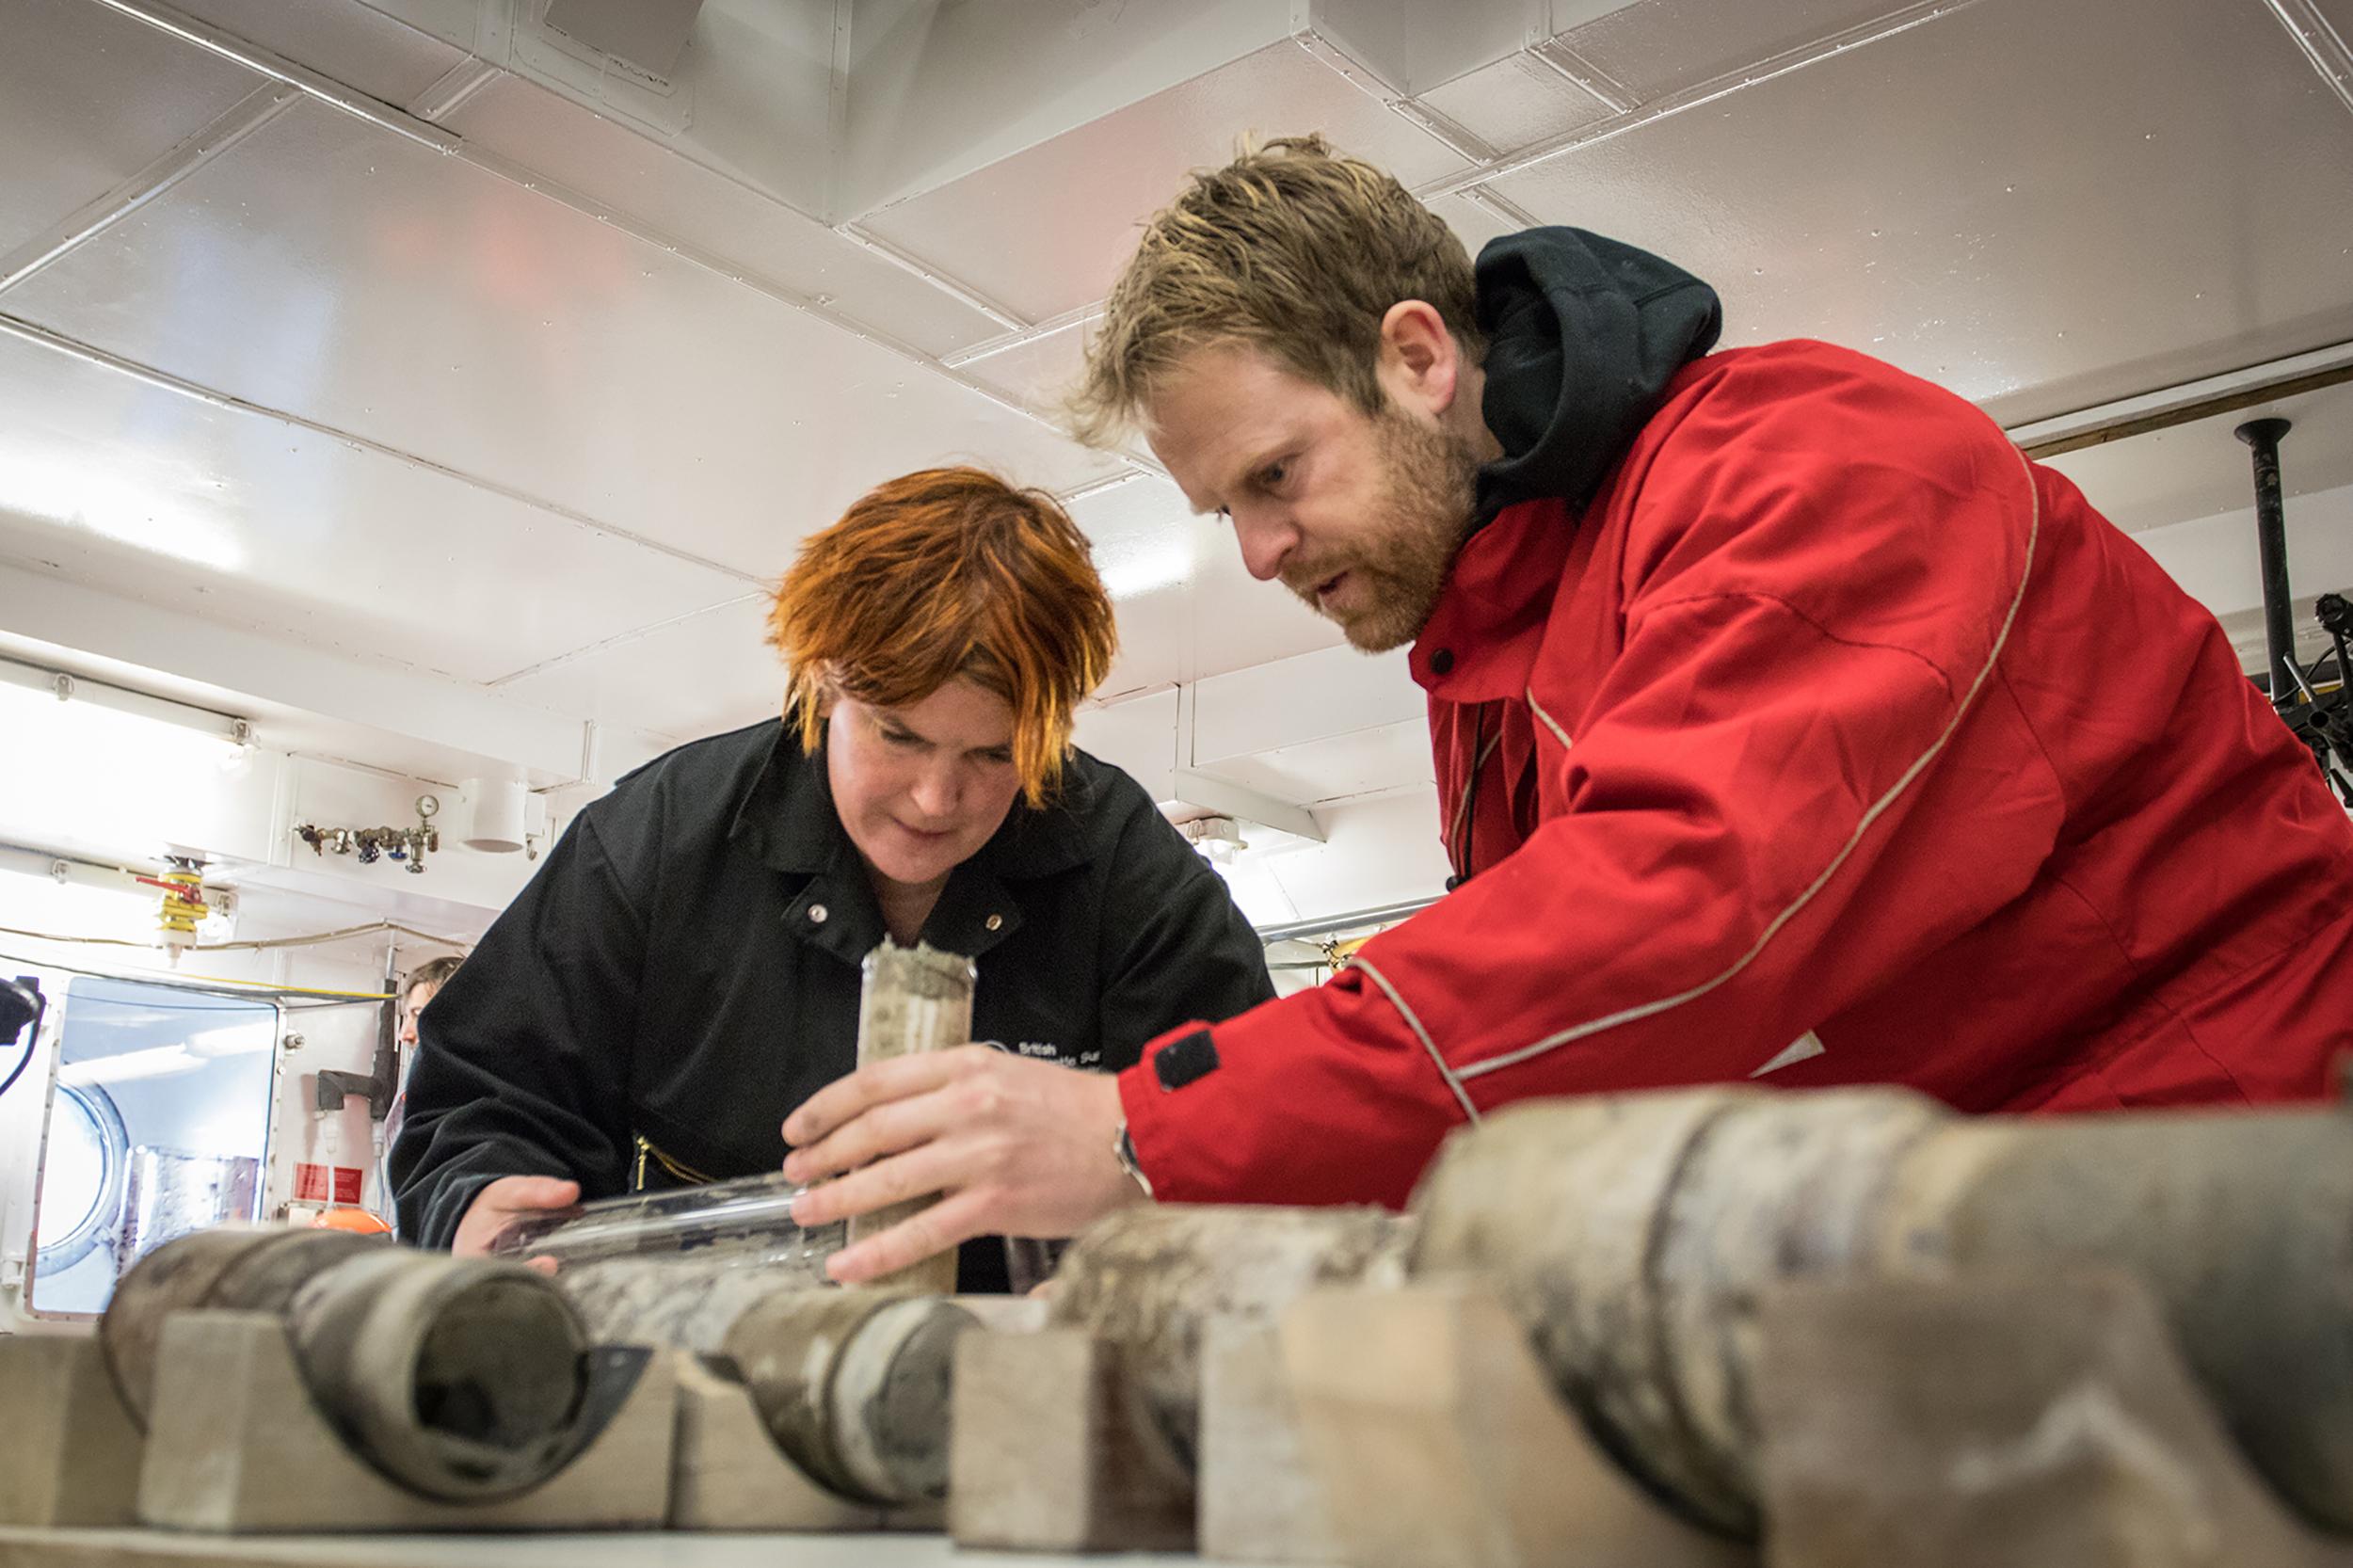 Professora Tina Van de Flierdt e Dr. Johann Klages analisando a amostra de sedimento // Créditos: T. Ronge, Instituto Alfred Wegener